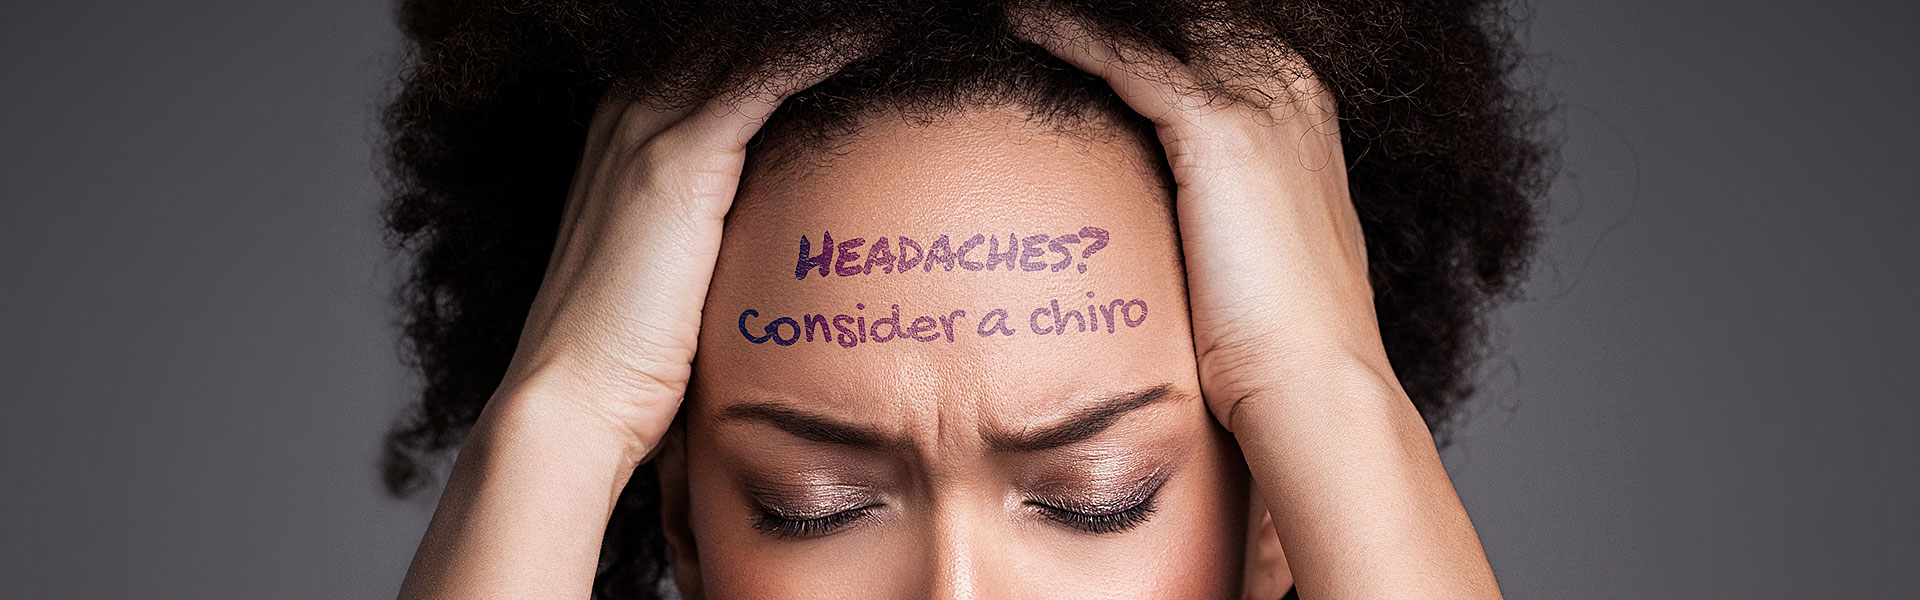 headache and migraine treatment Singapore